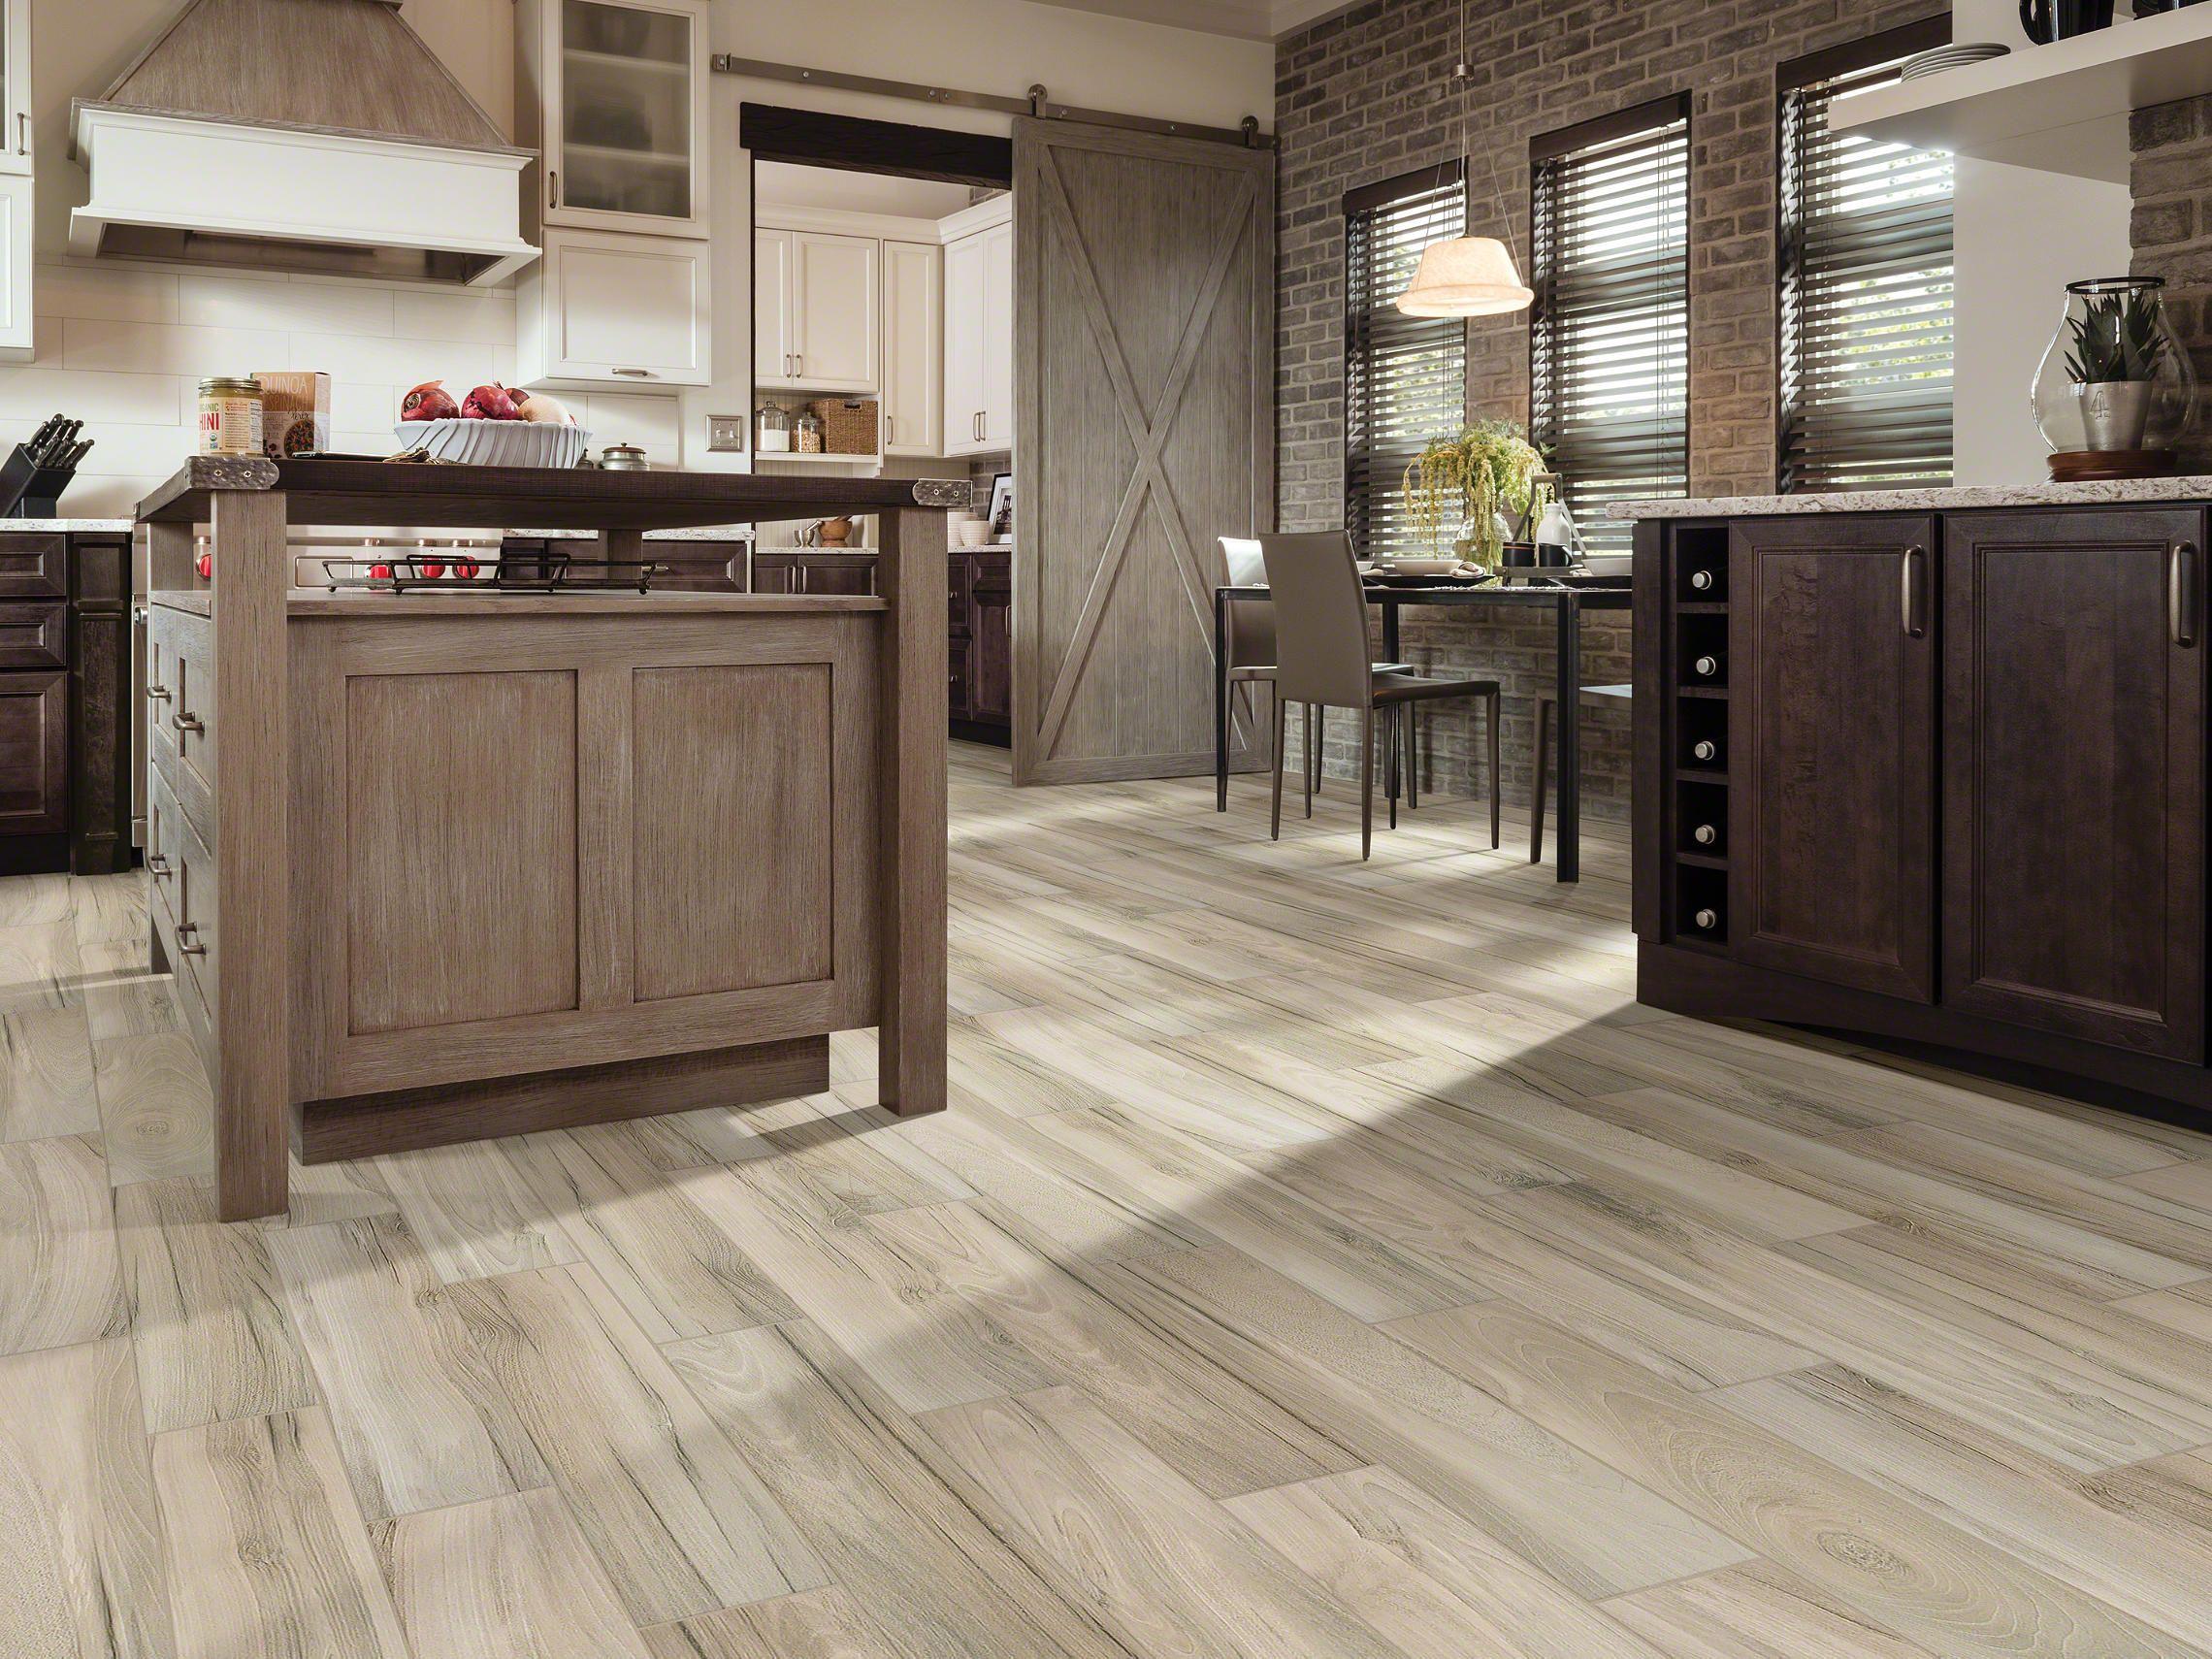 Voyage 6x24 Taupe Room View Kitchen Flooring Bedroom